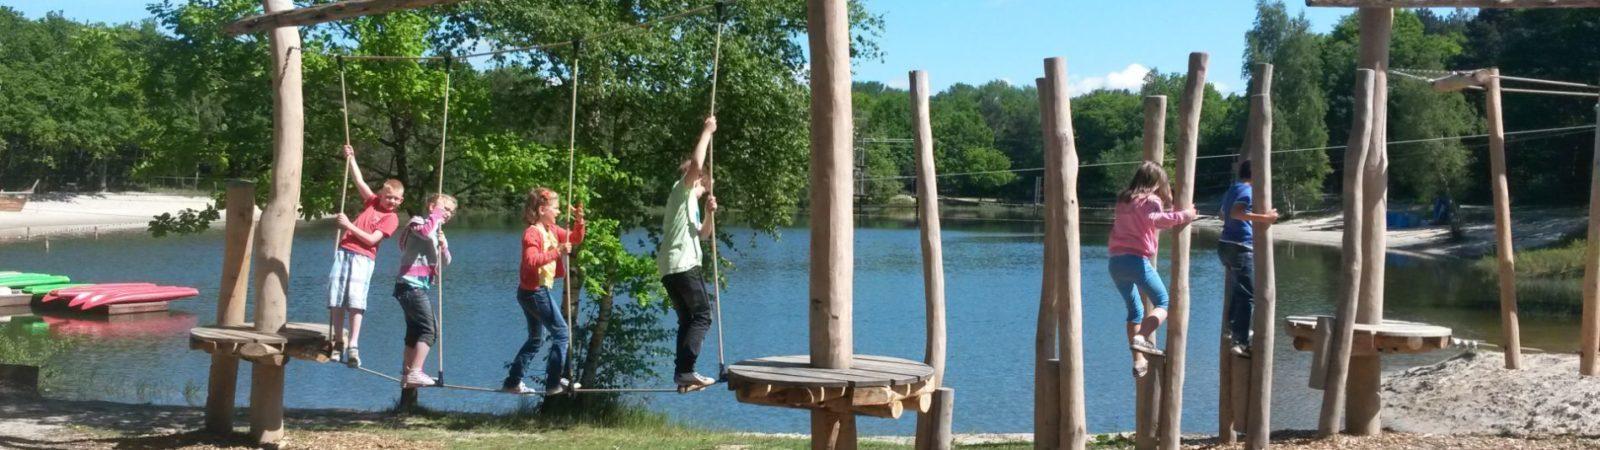 Klimpark Grolloo - Witterzomer Drenthe